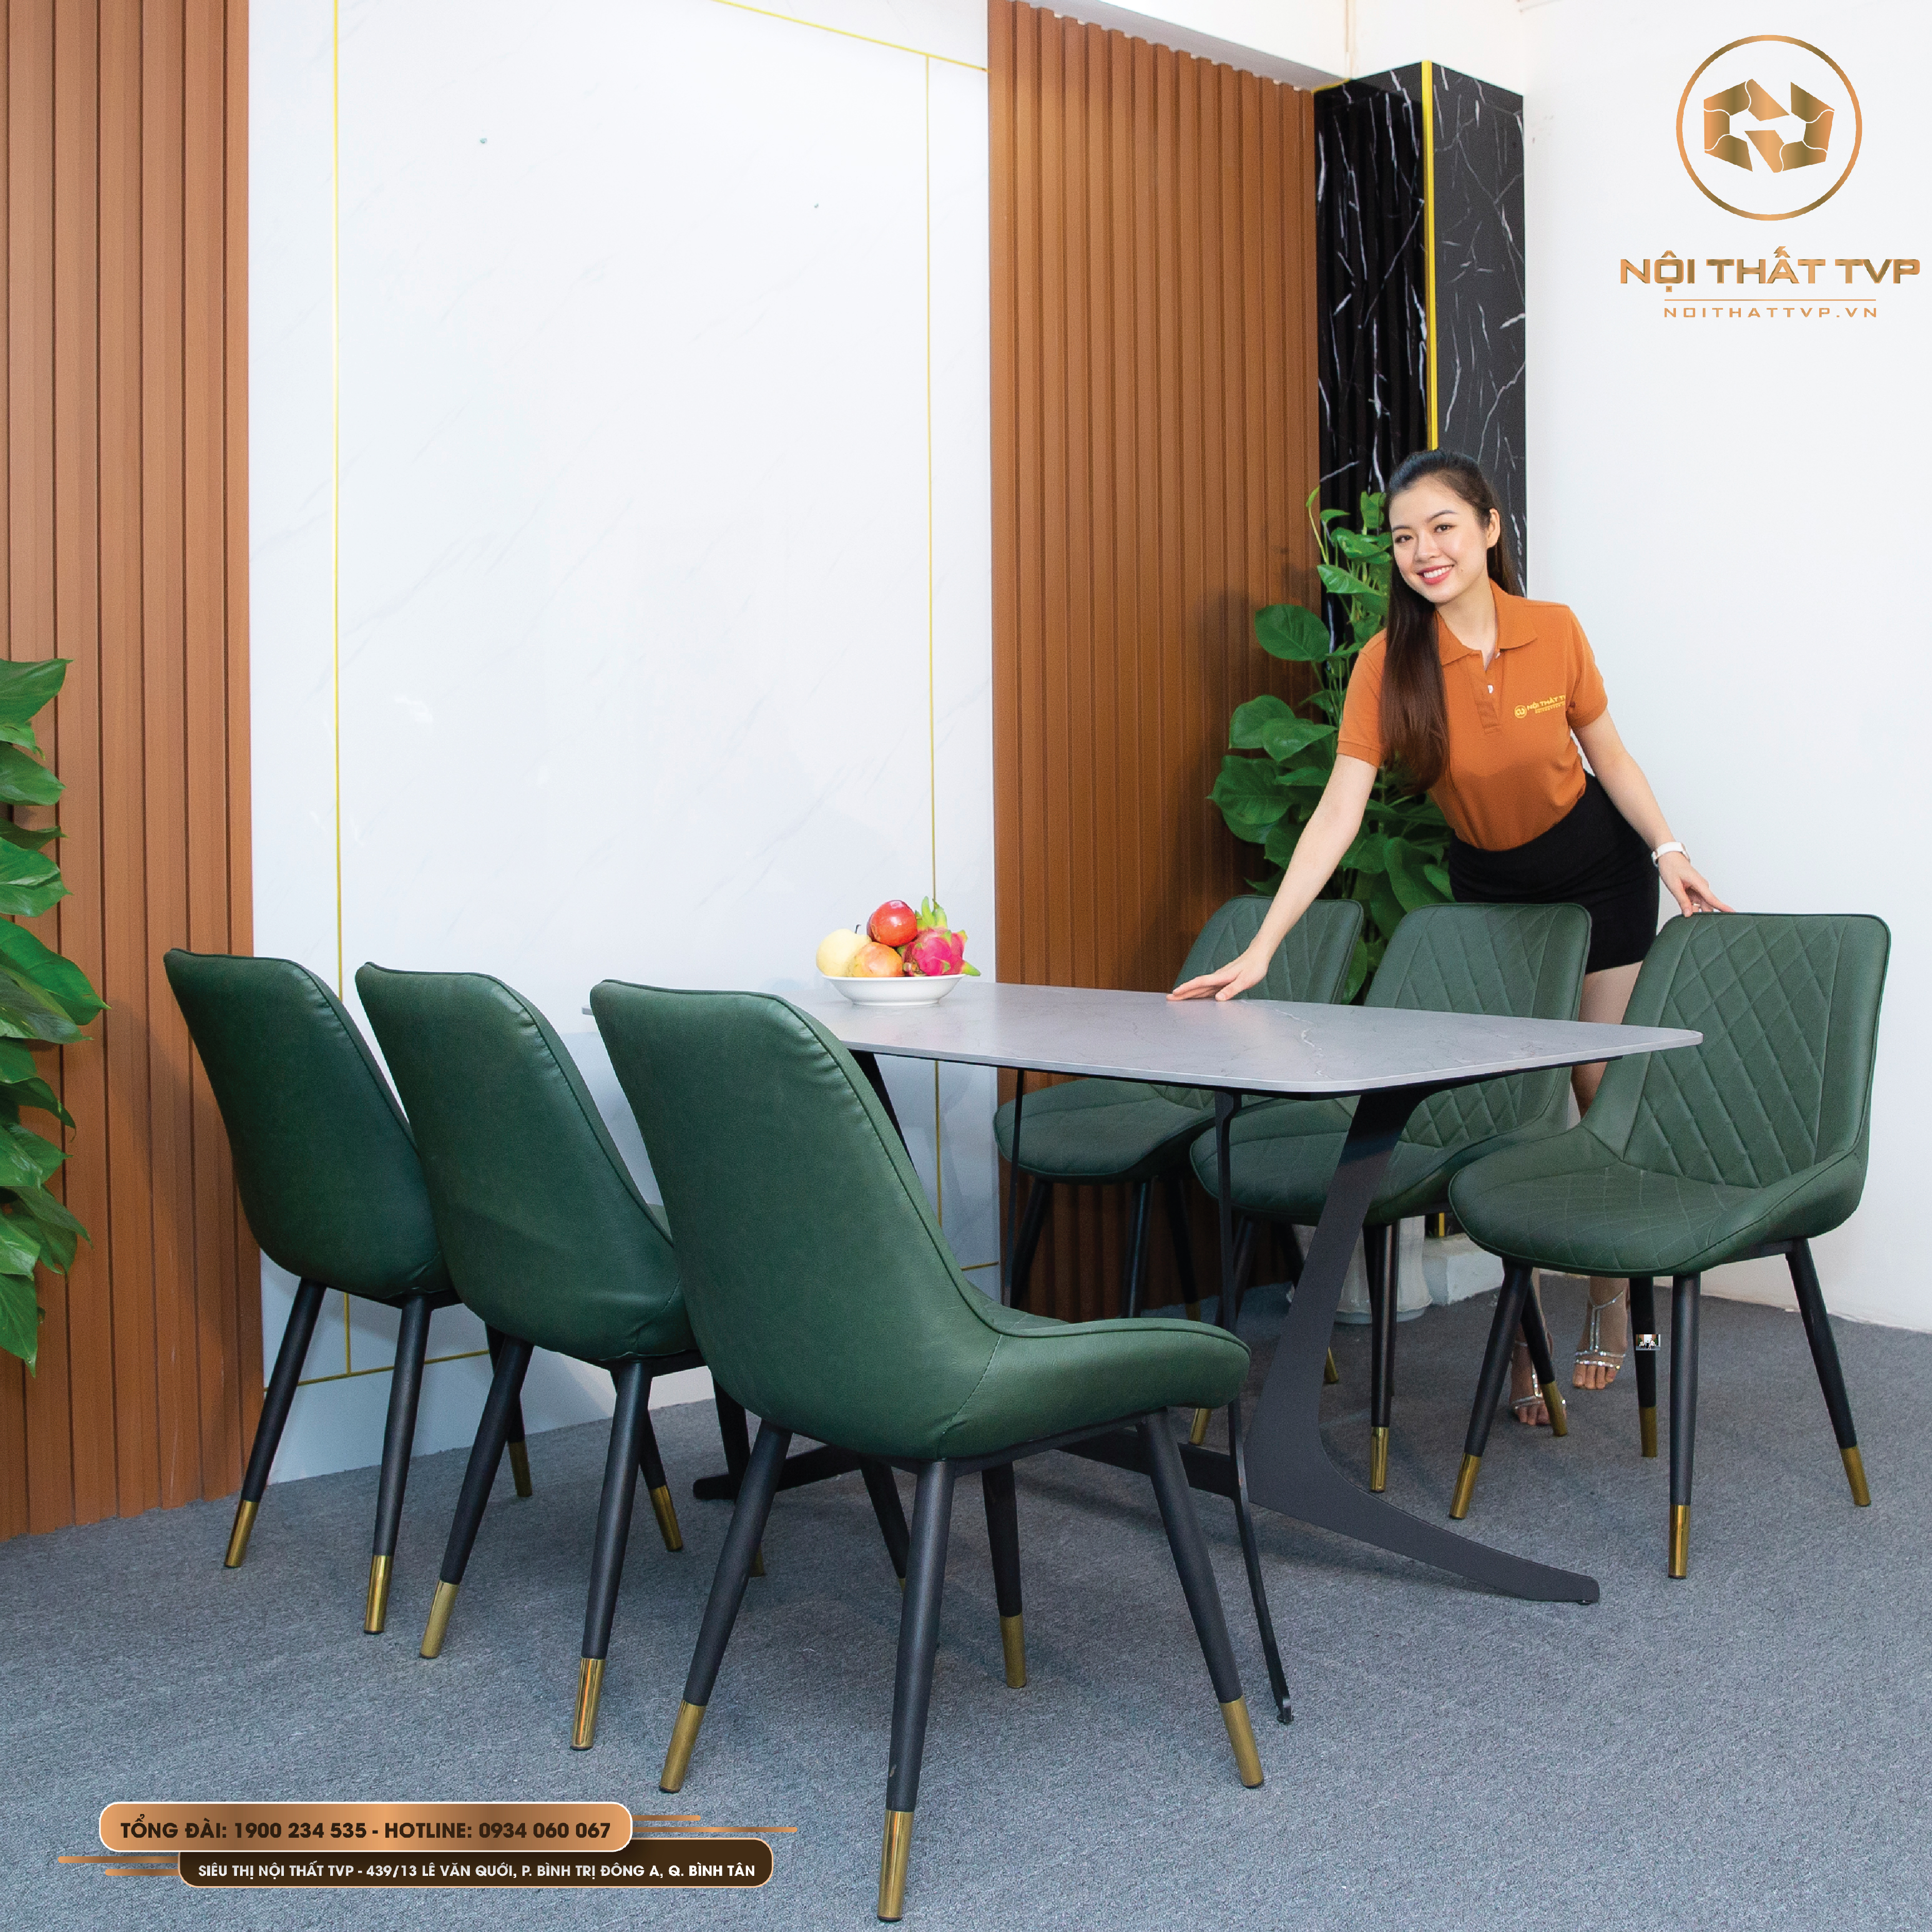 bộ bàn ghế ăn 6 ghế